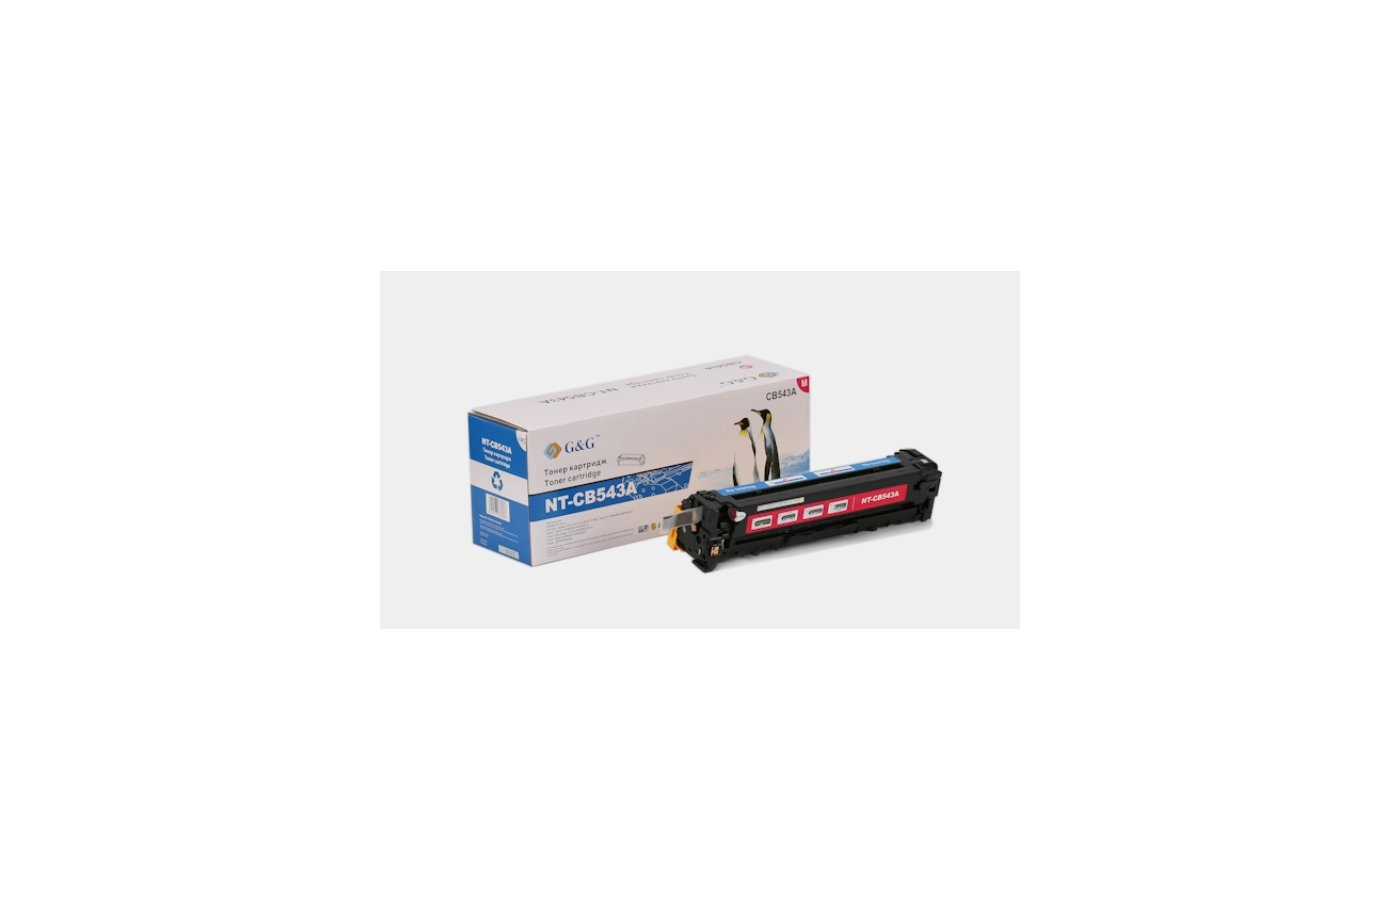 Картридж лазерный GG NT-CB543A Совместимый пурпурный для HP Color LJ CM1312 CP1215/1515/1518 (1400 стр)